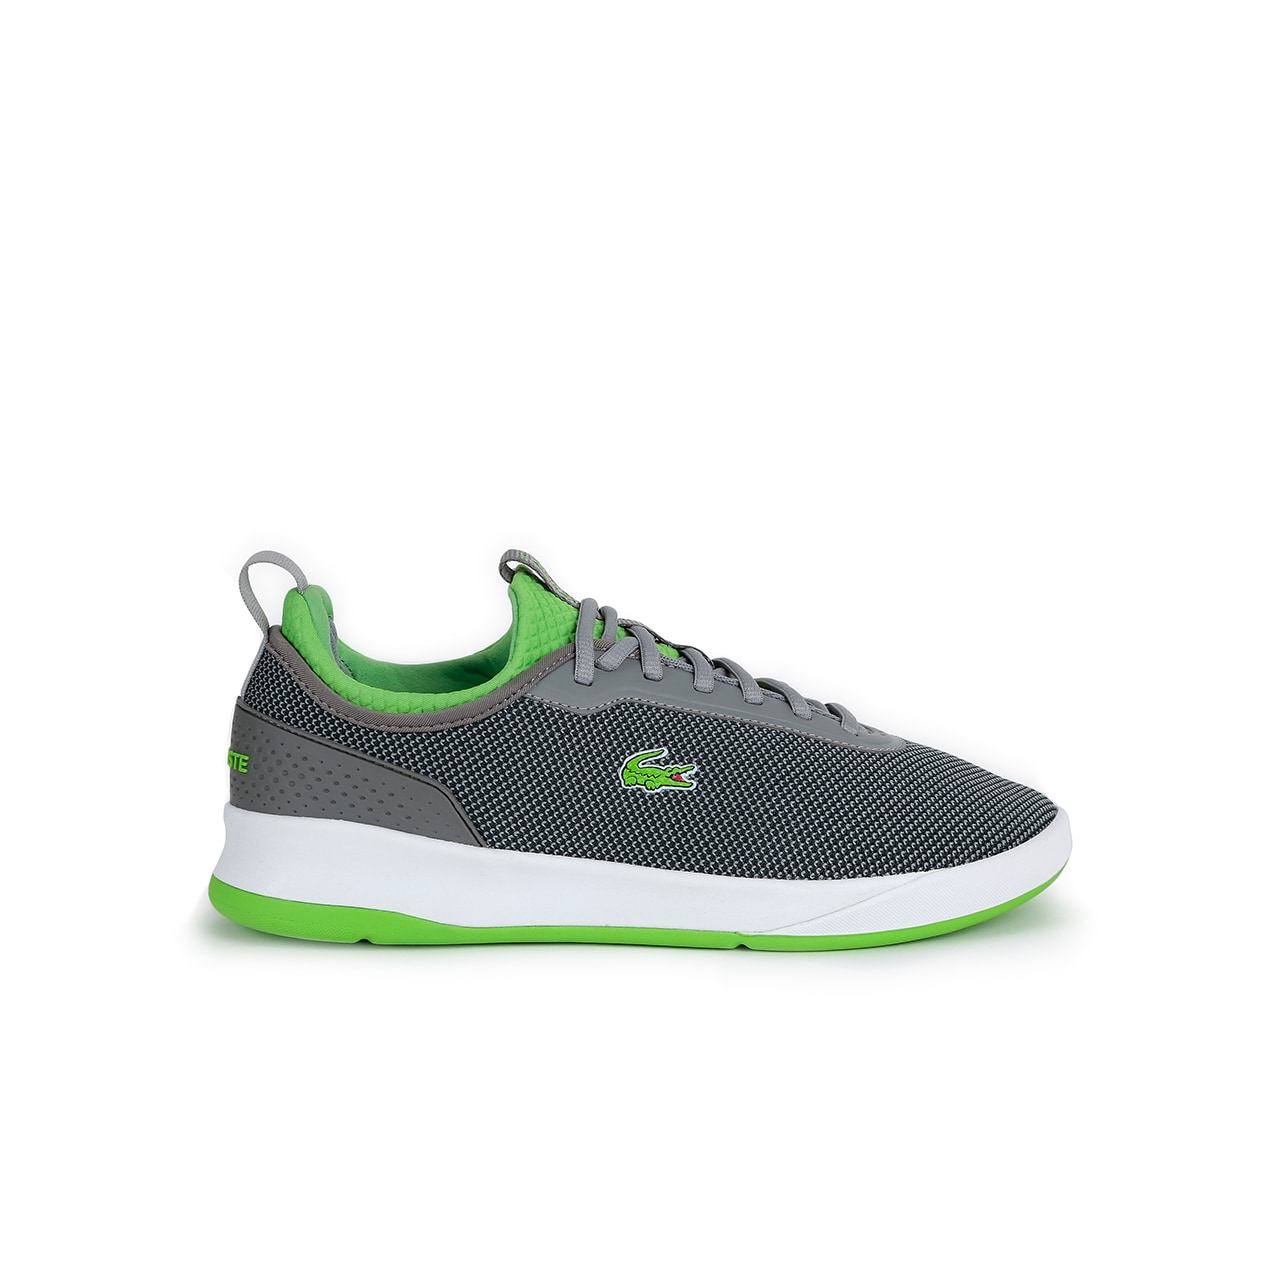 Men's LT Spirit 2.0 Textile Sneakers